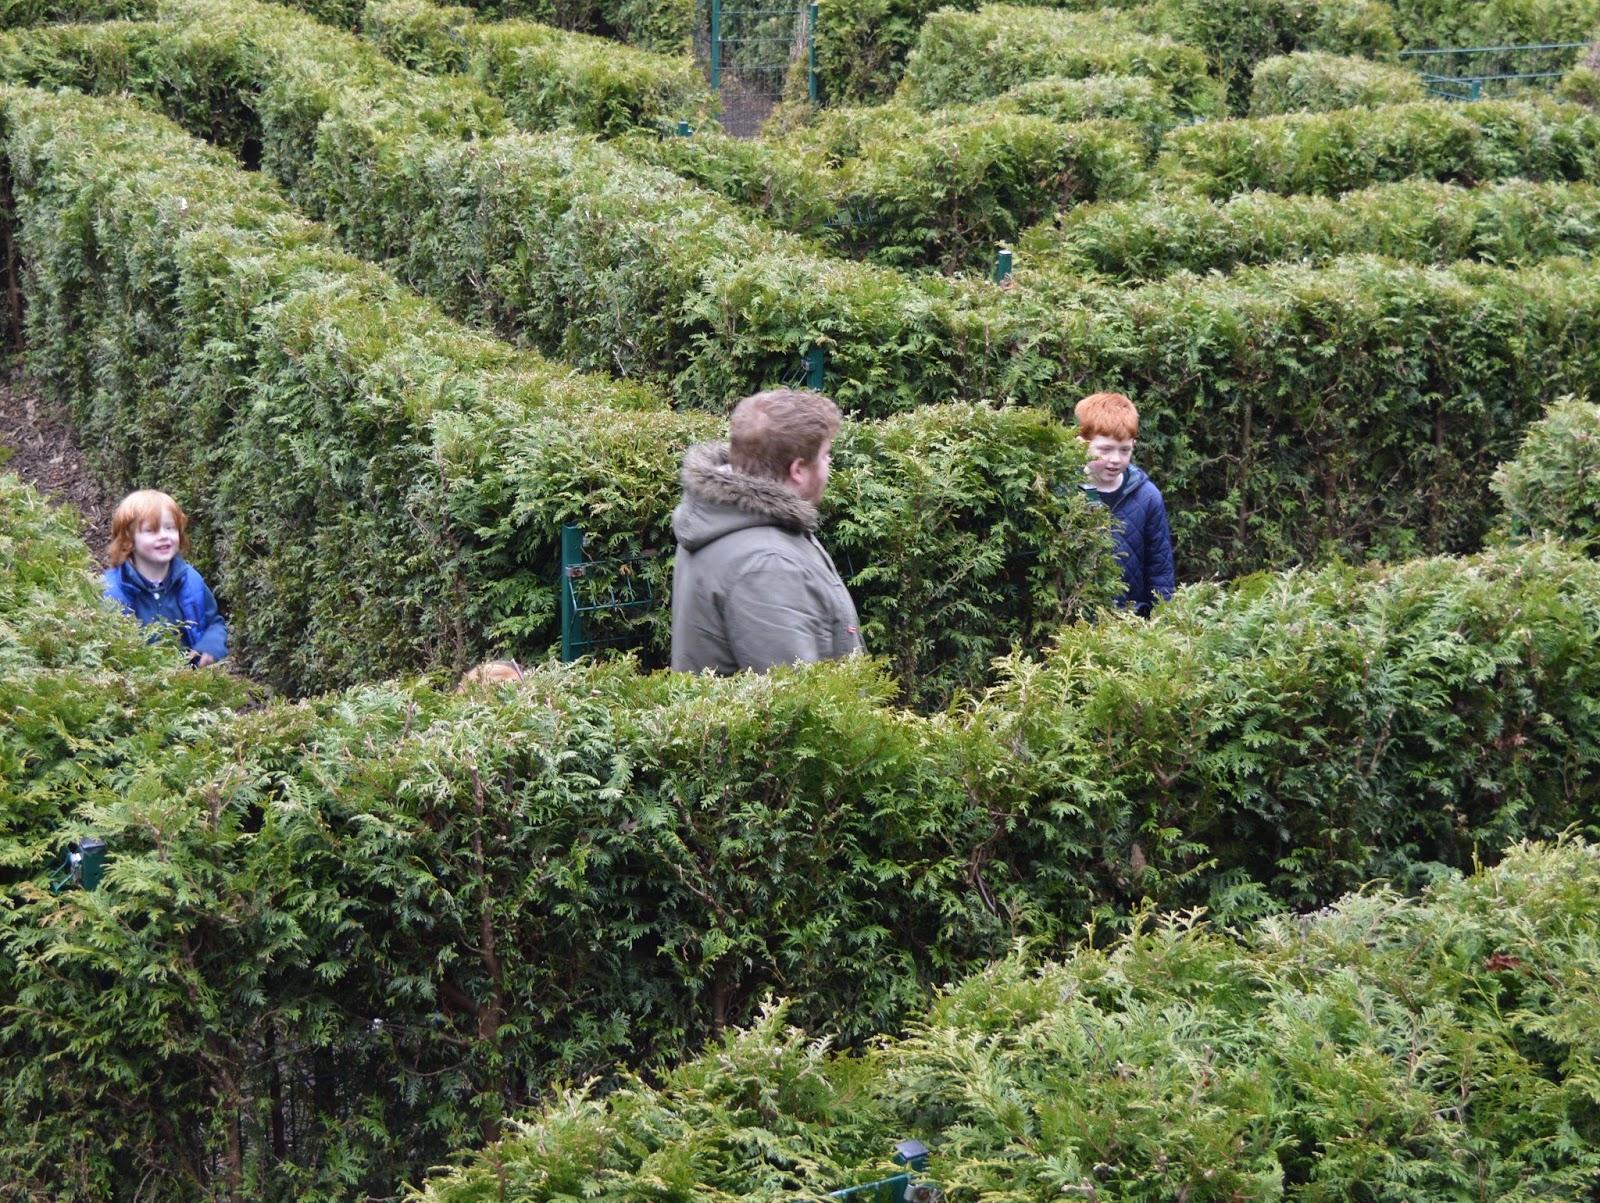 Saltwell Park Maze